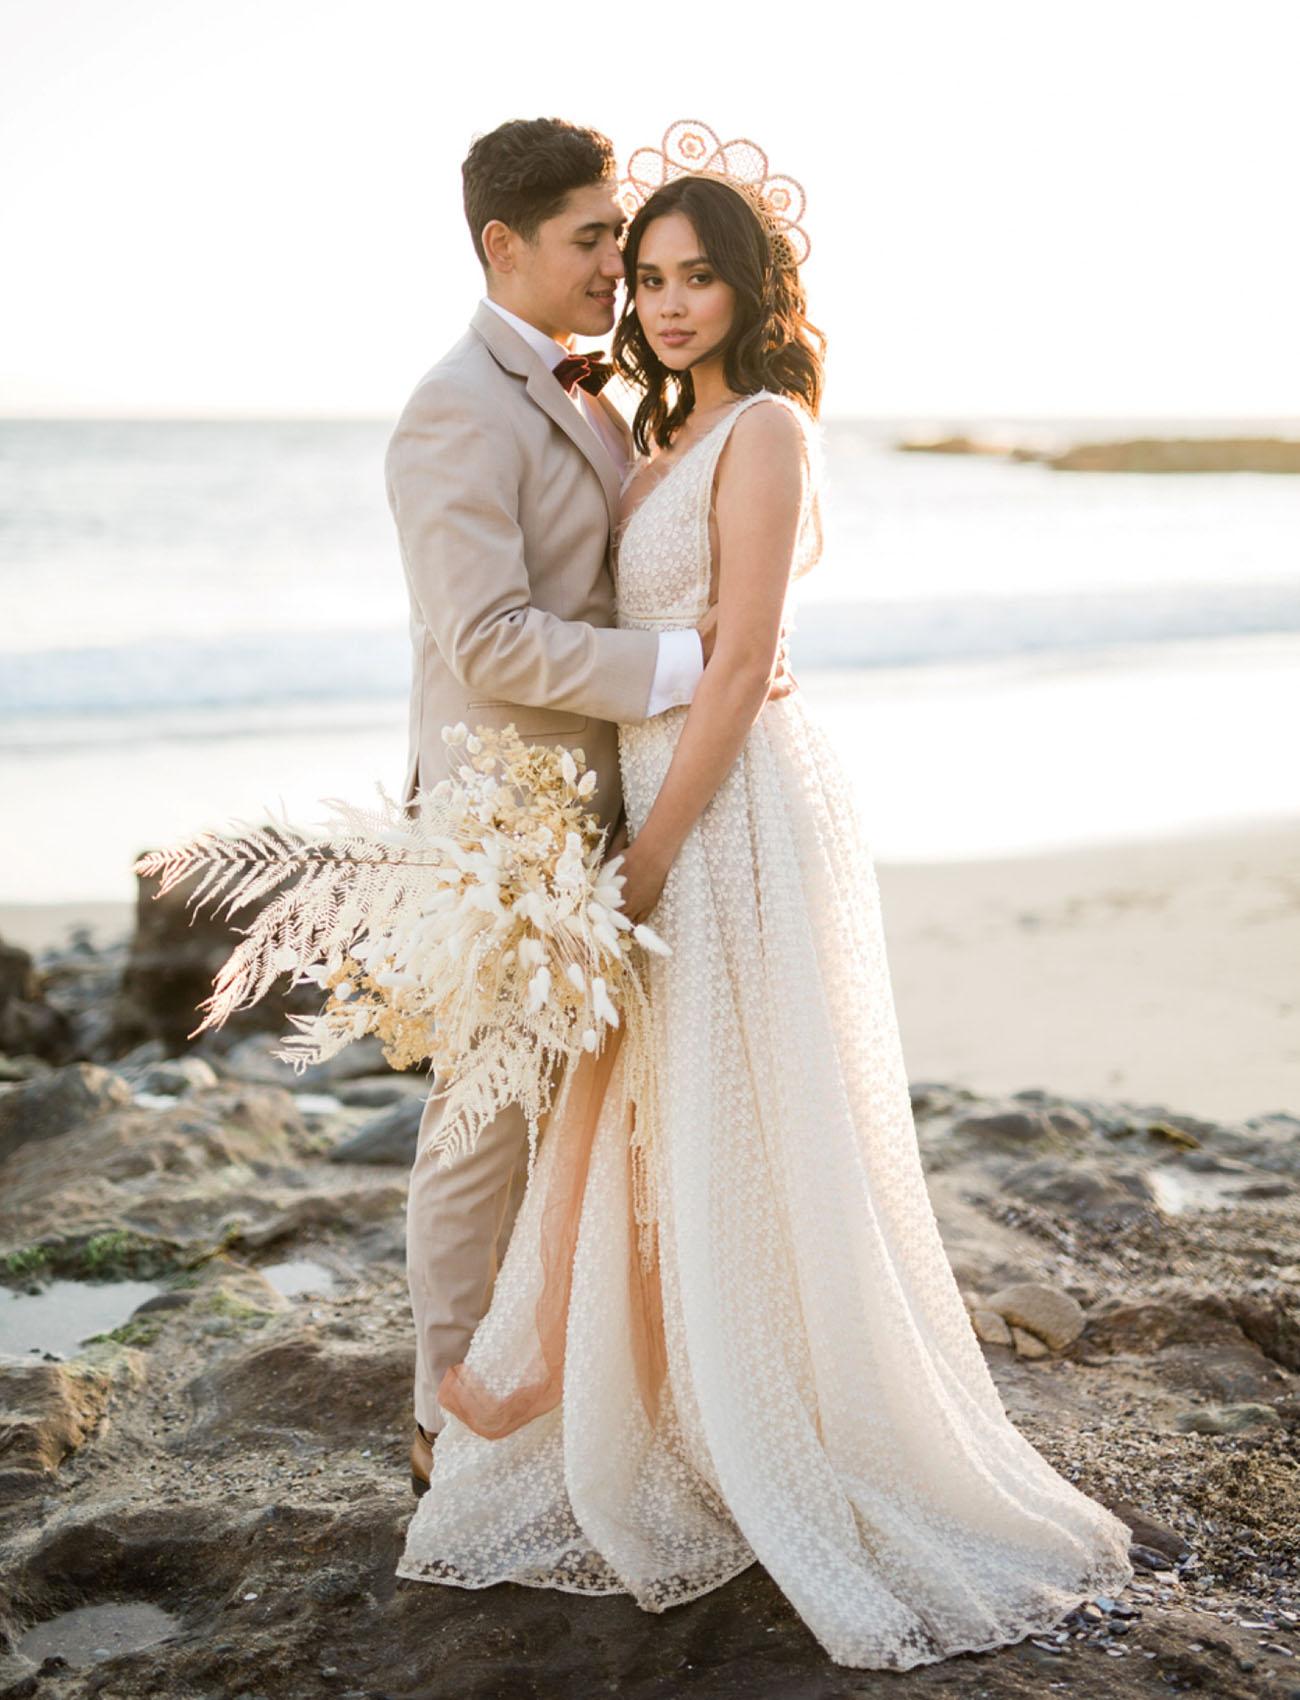 Hotel Joaquin Wedding Inspiration